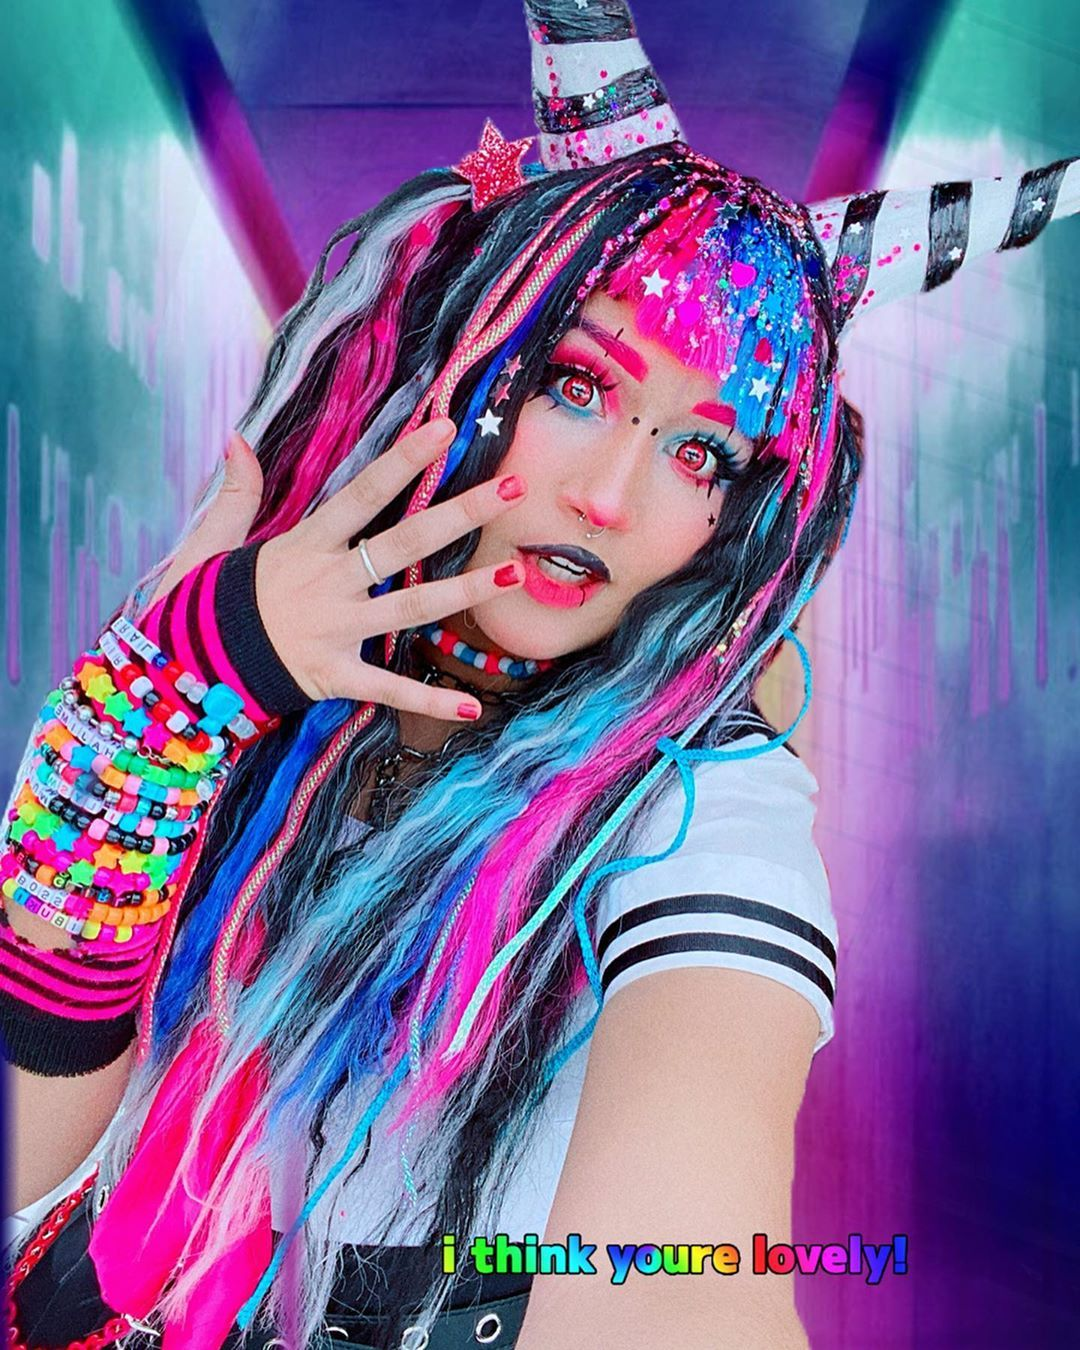 Ibuki Mioda Cosplay By Lampyridaeee Cosplay Cosplay Characters Amazing Cosplay